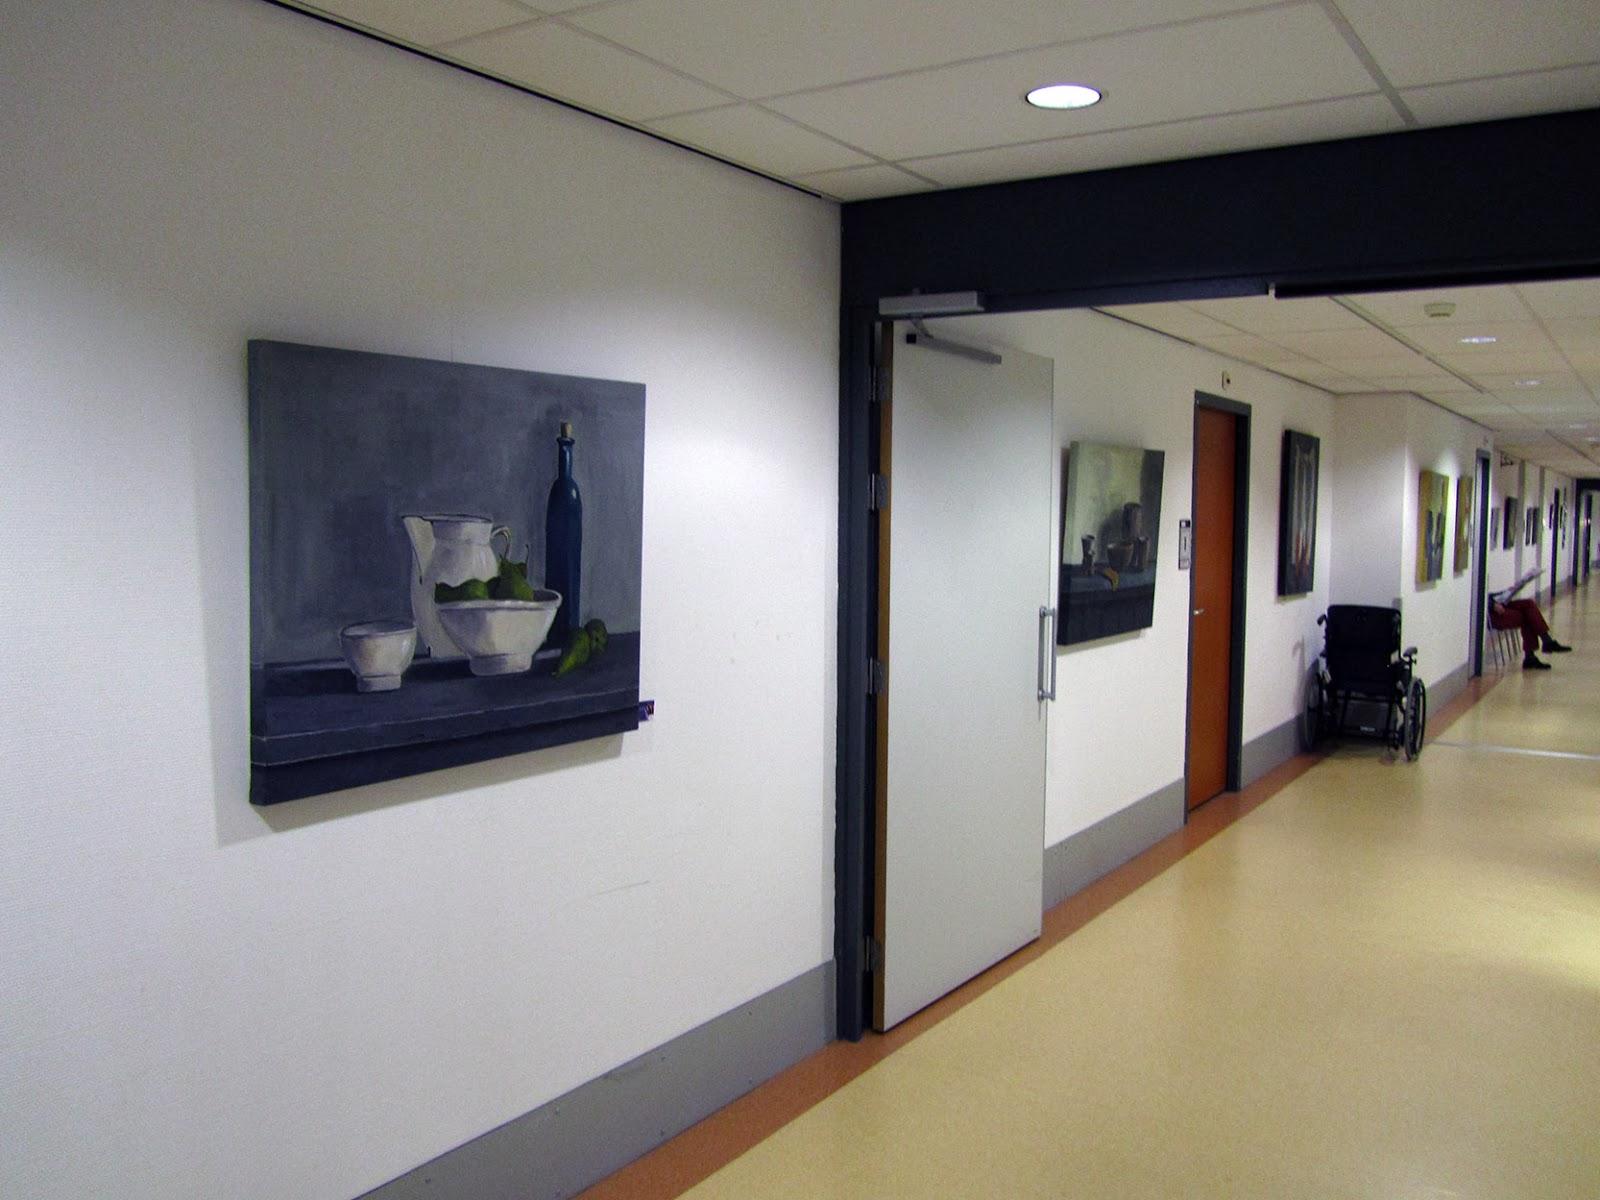 long corridor in nursing home